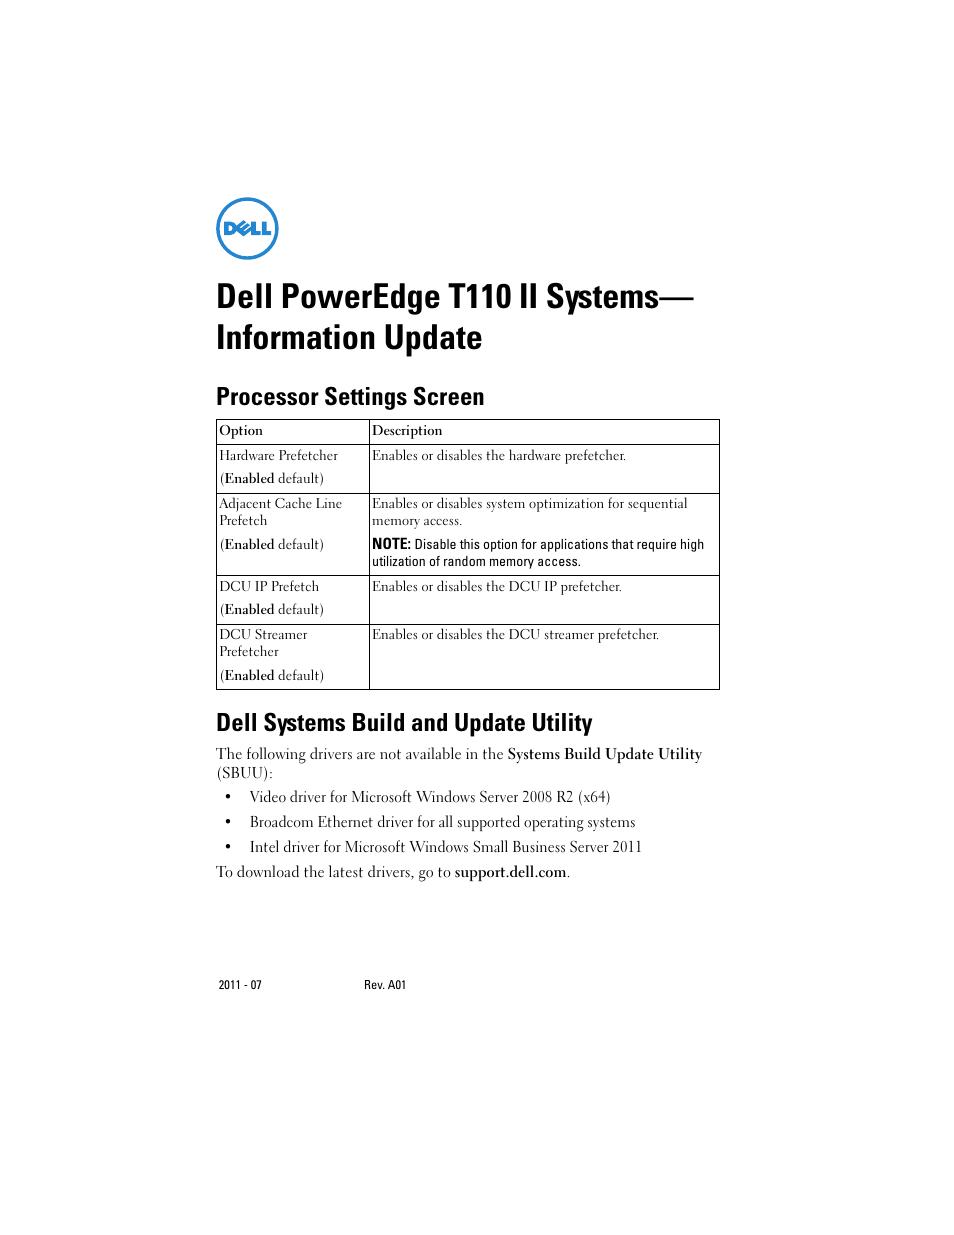 Dell driver update utility poweredge | Best method for